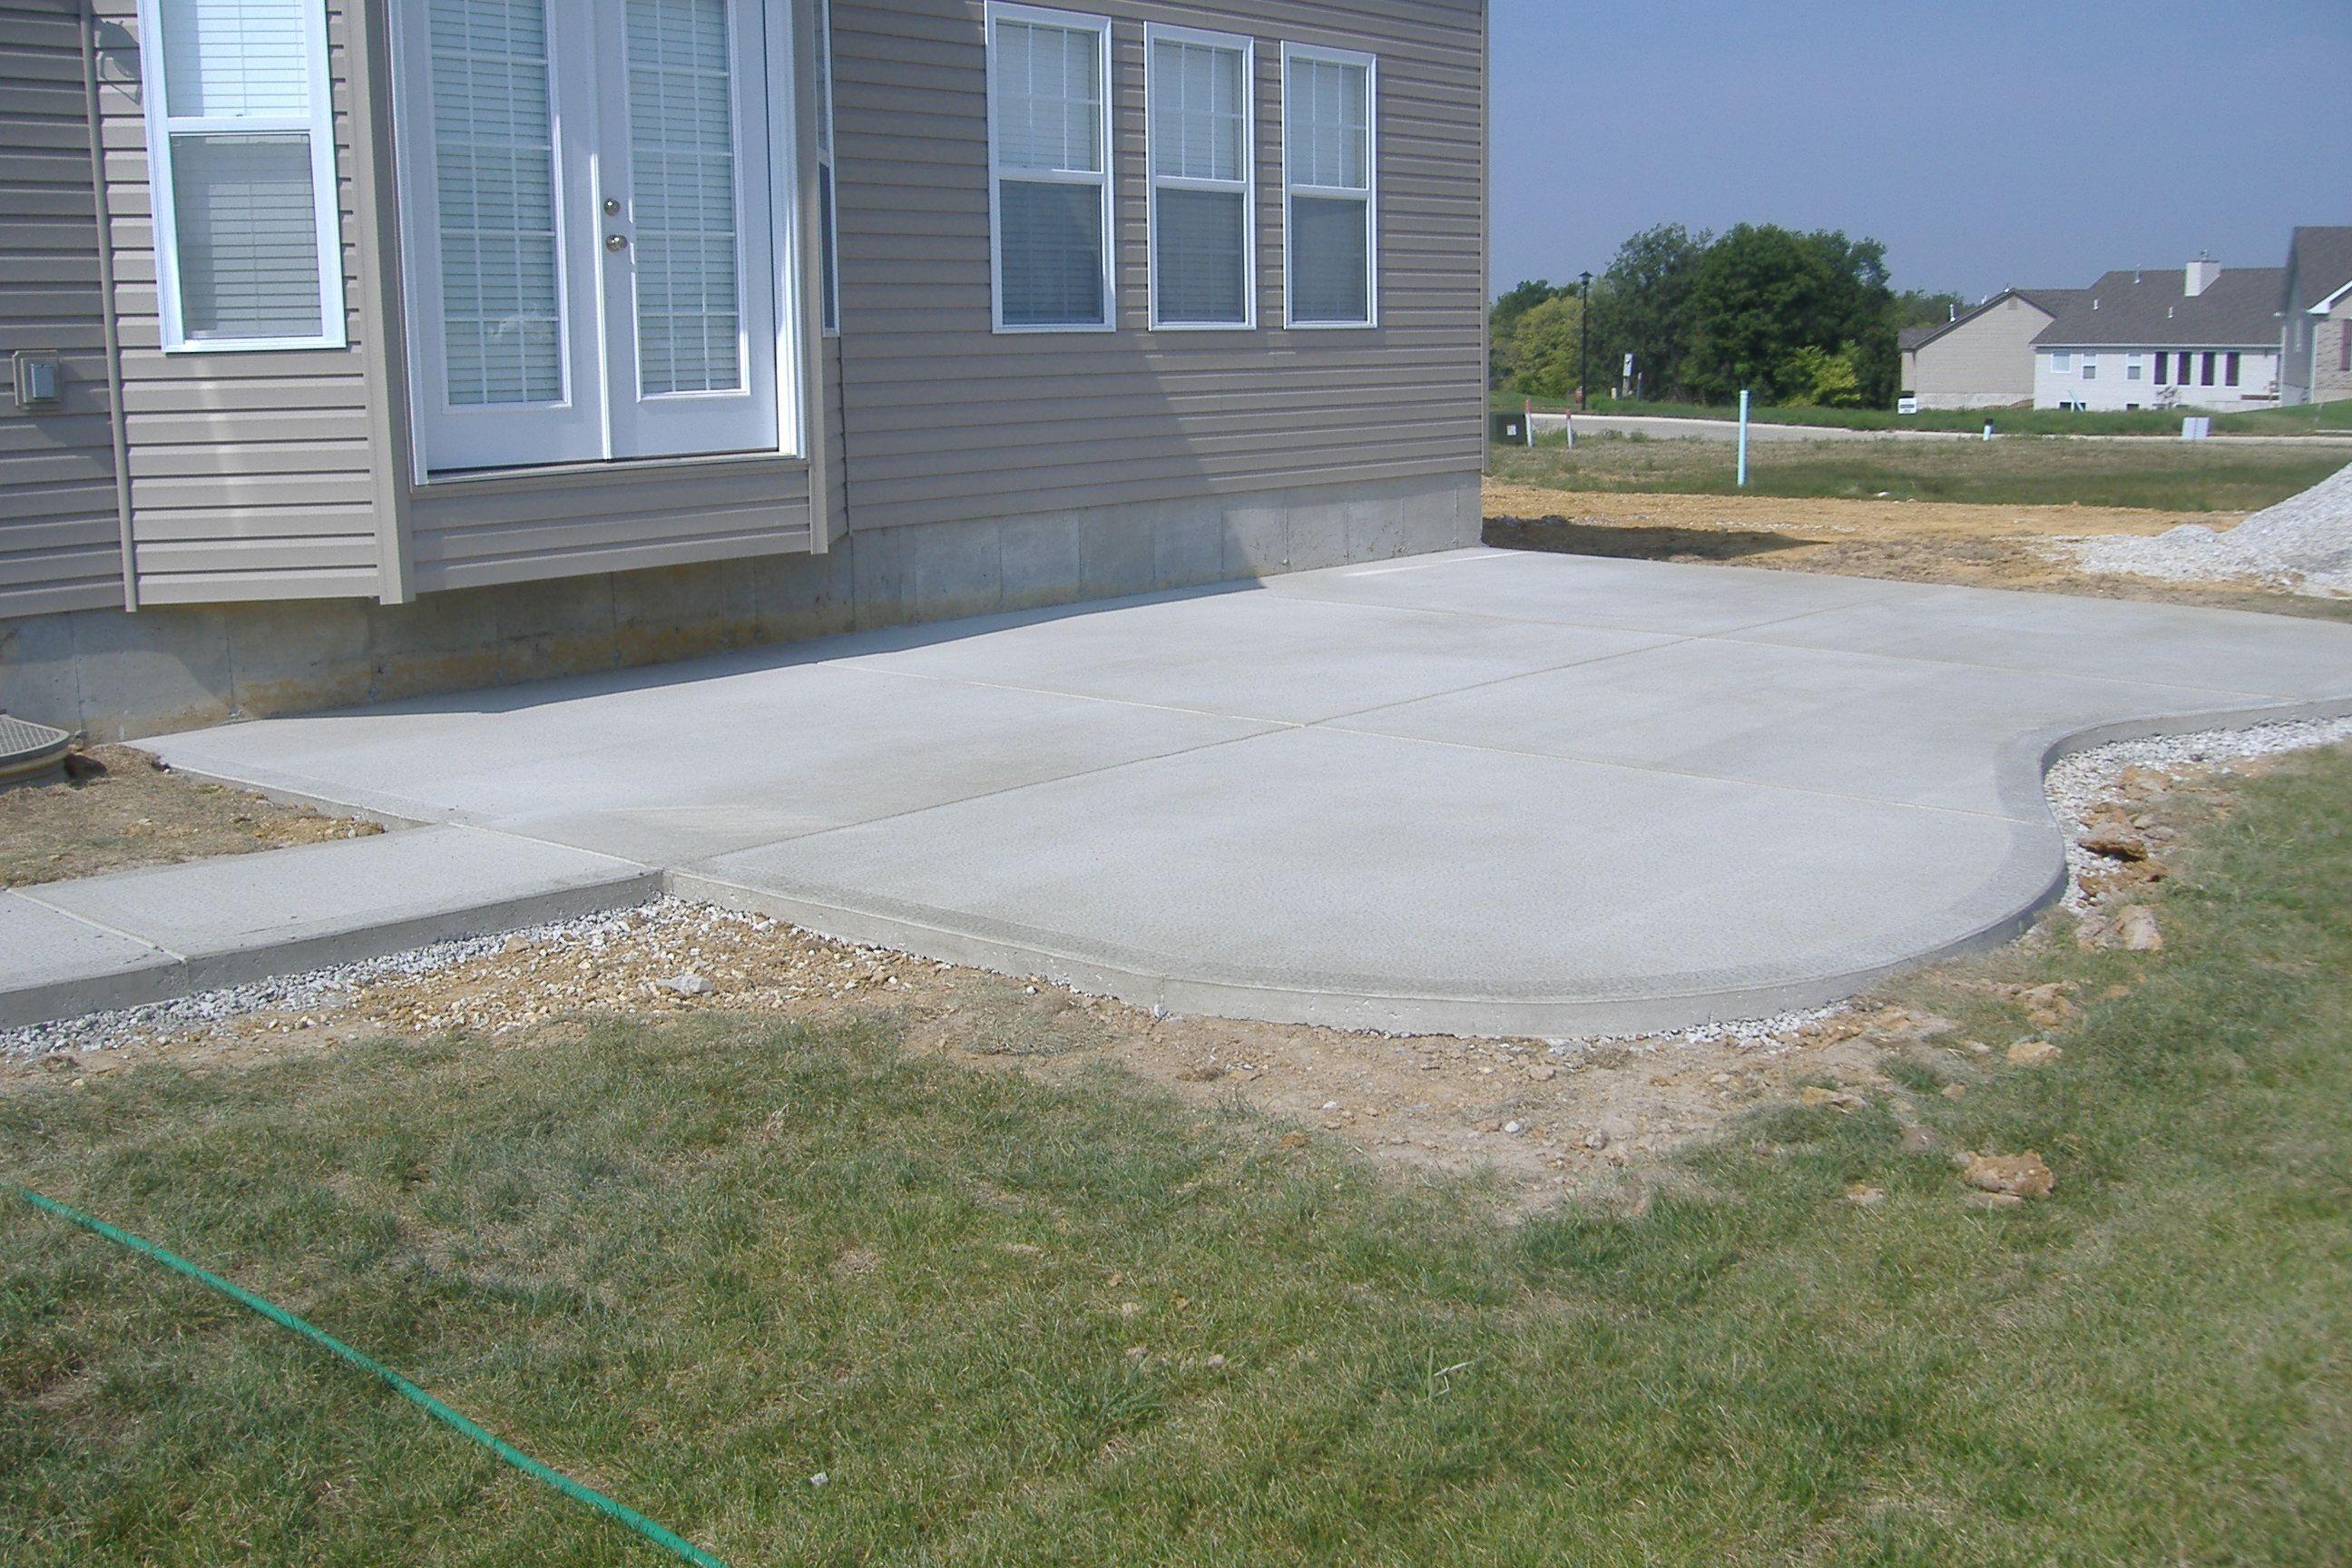 Simple Concrete Patio Design Ideas Thefoxy Blog With Backyard Concrete Ideas Backyard Backyard Concrete Backyard Poured Concrete Patio Concrete Patio Designs